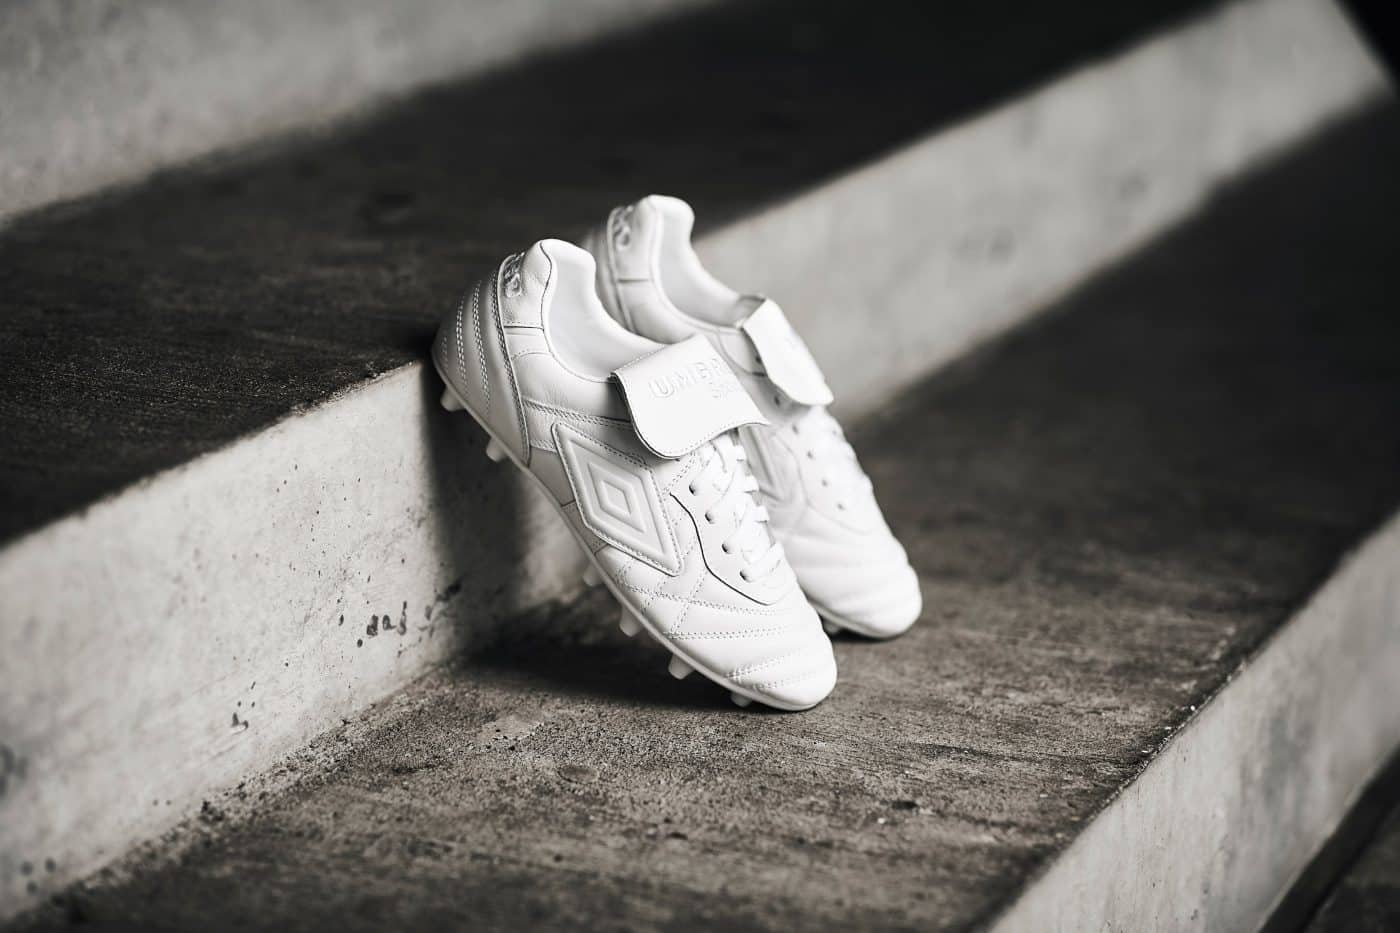 umbro-speciali-98-pro-blanc-4